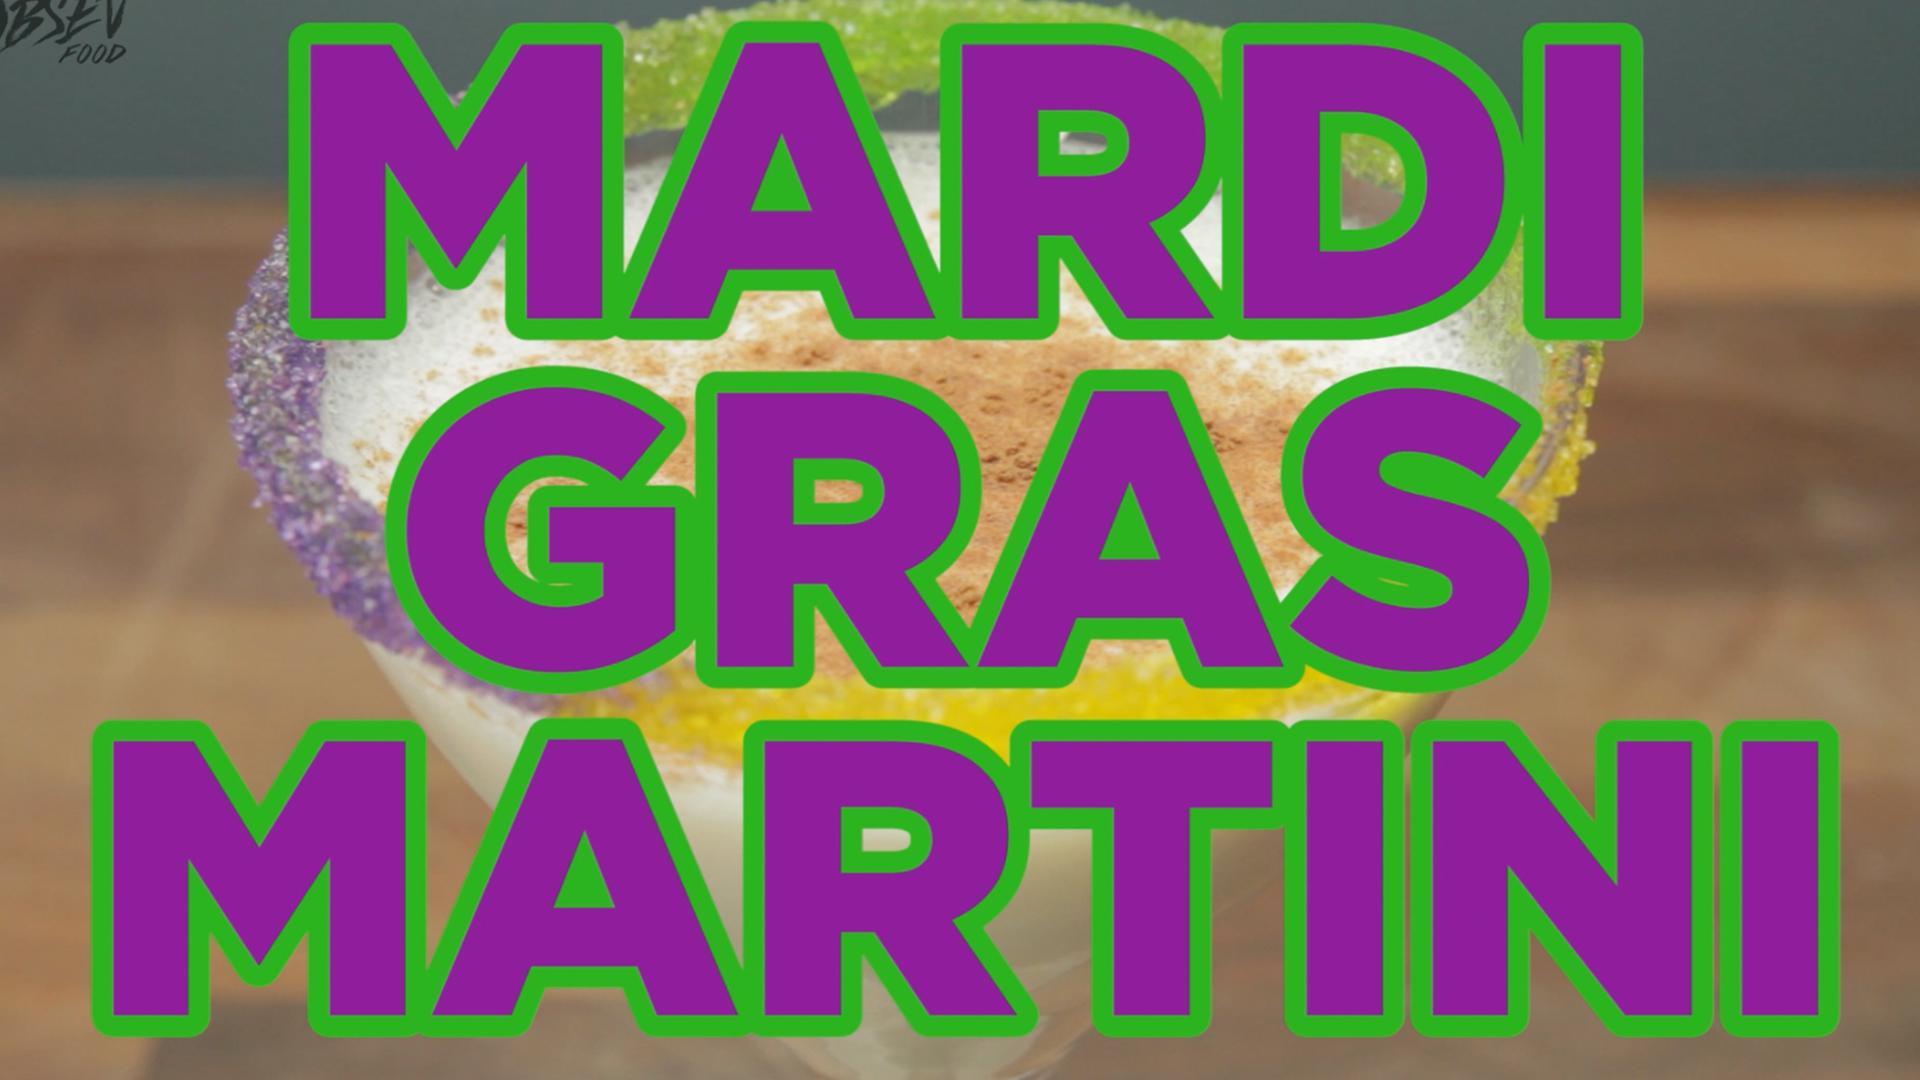 How To Make A Mardi Gras Martini - Full Recipe